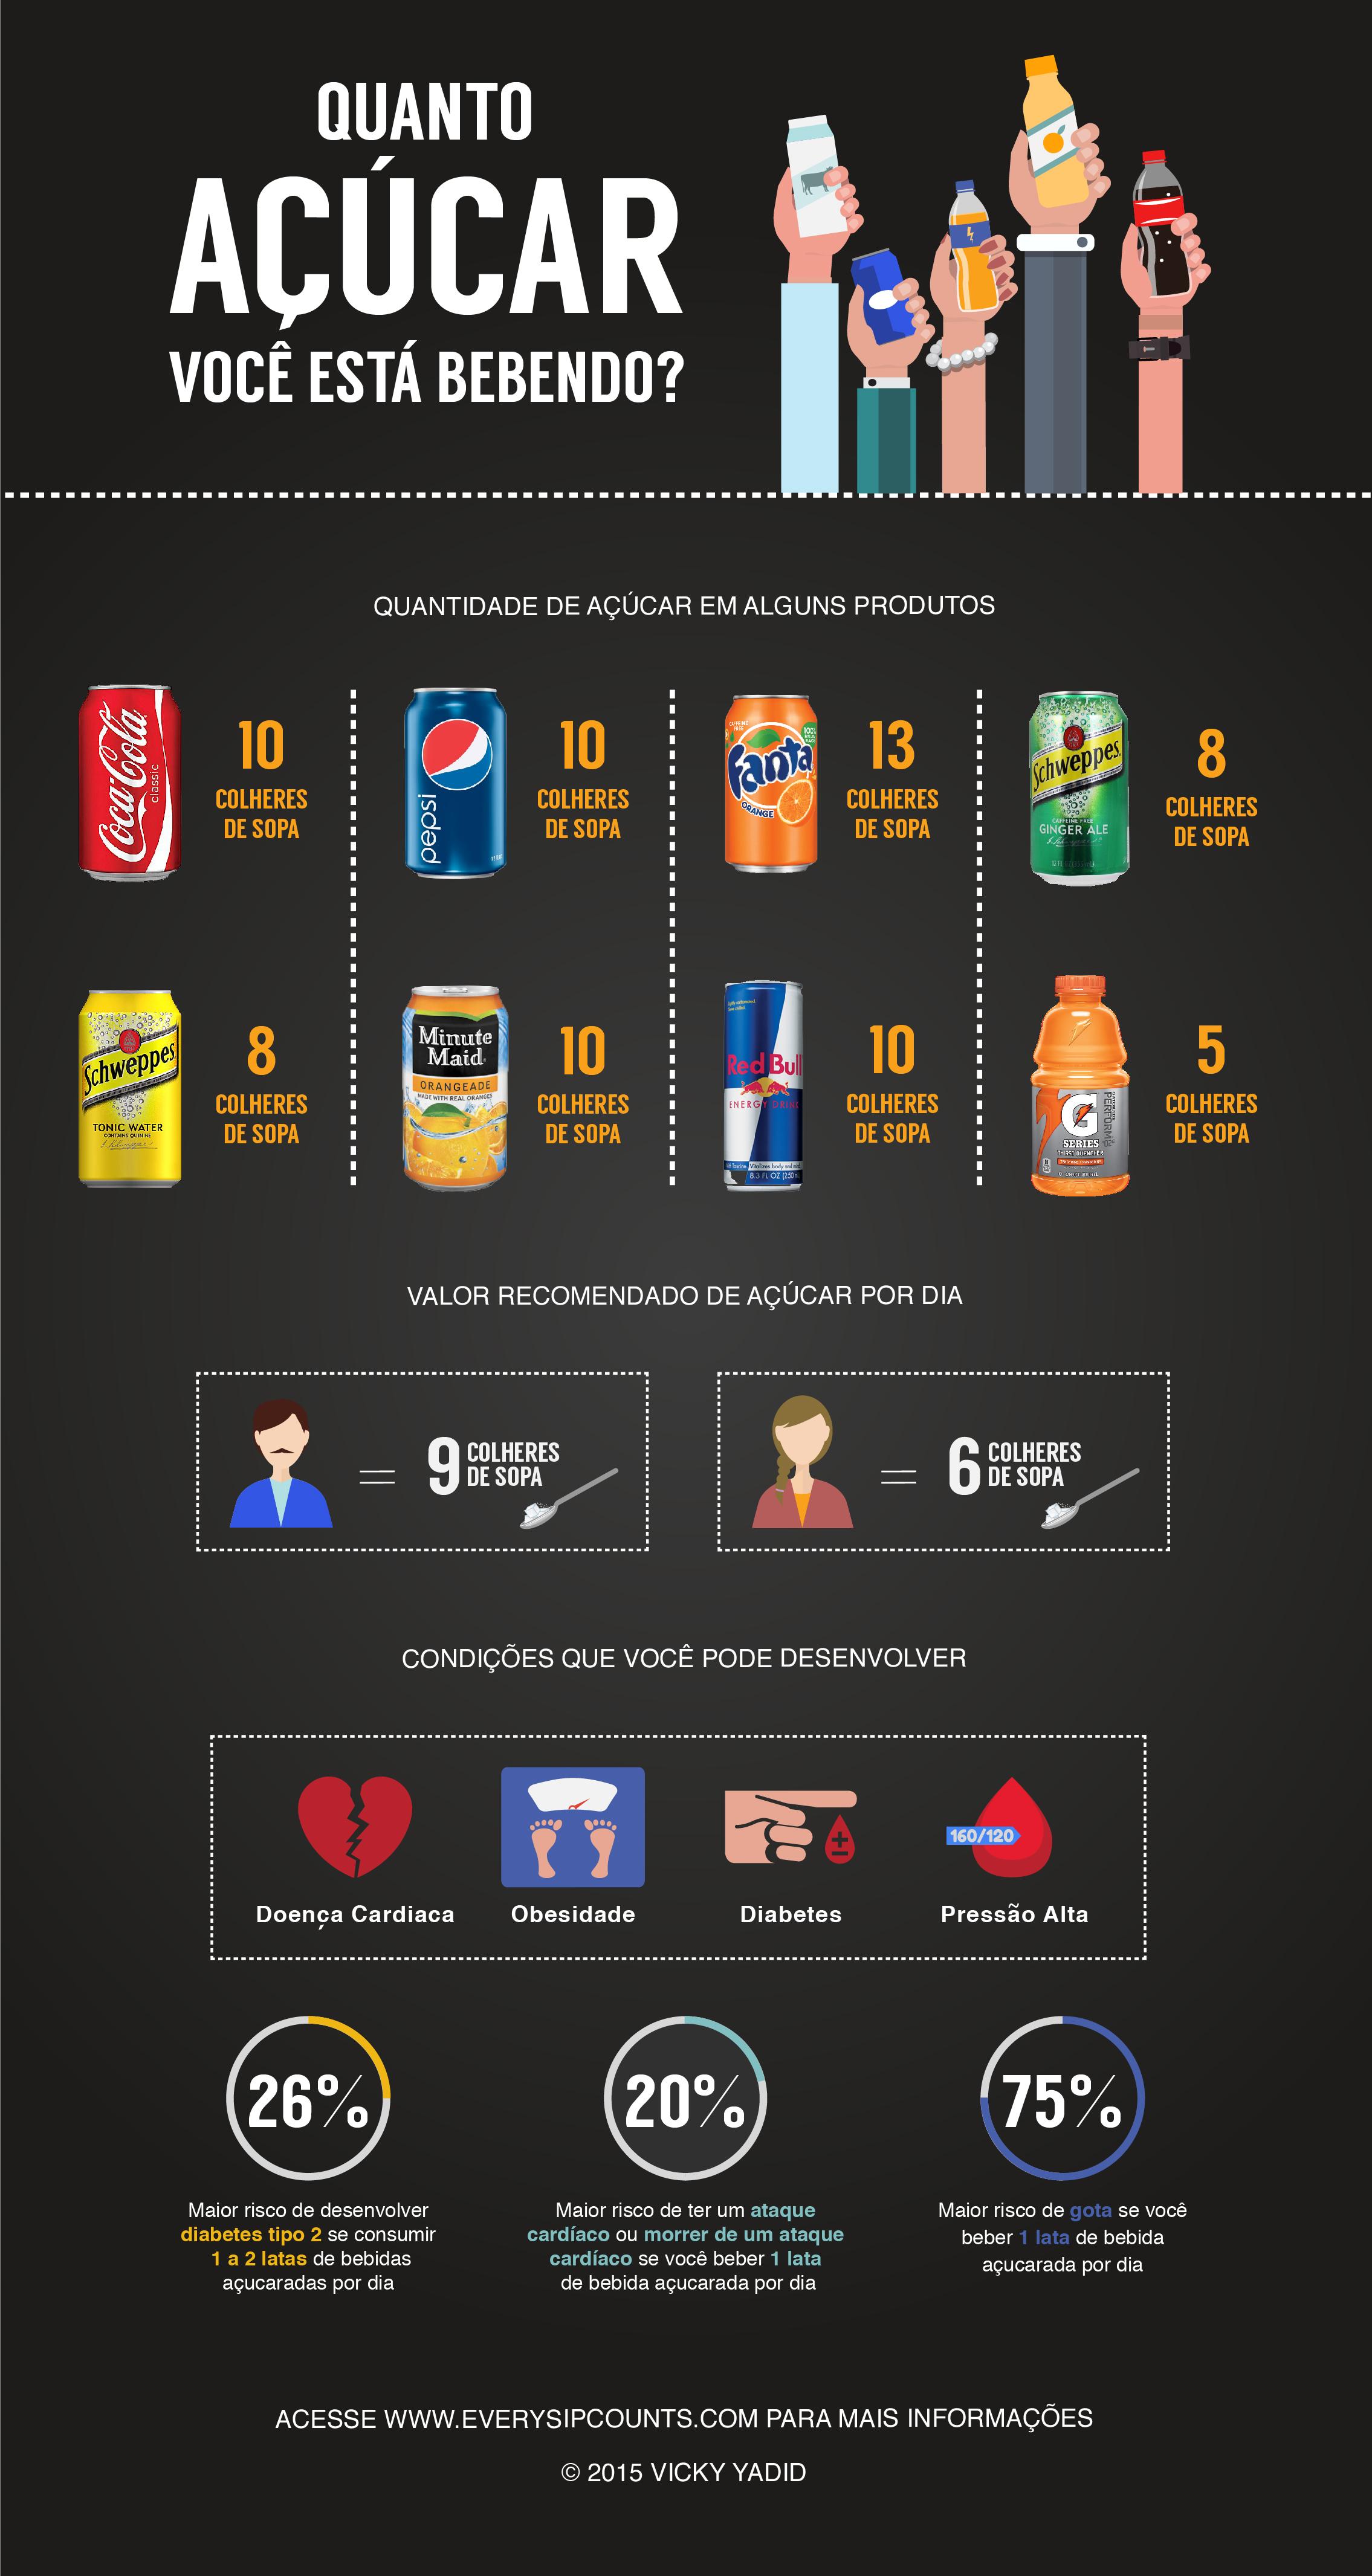 infographic-vejario.jpg